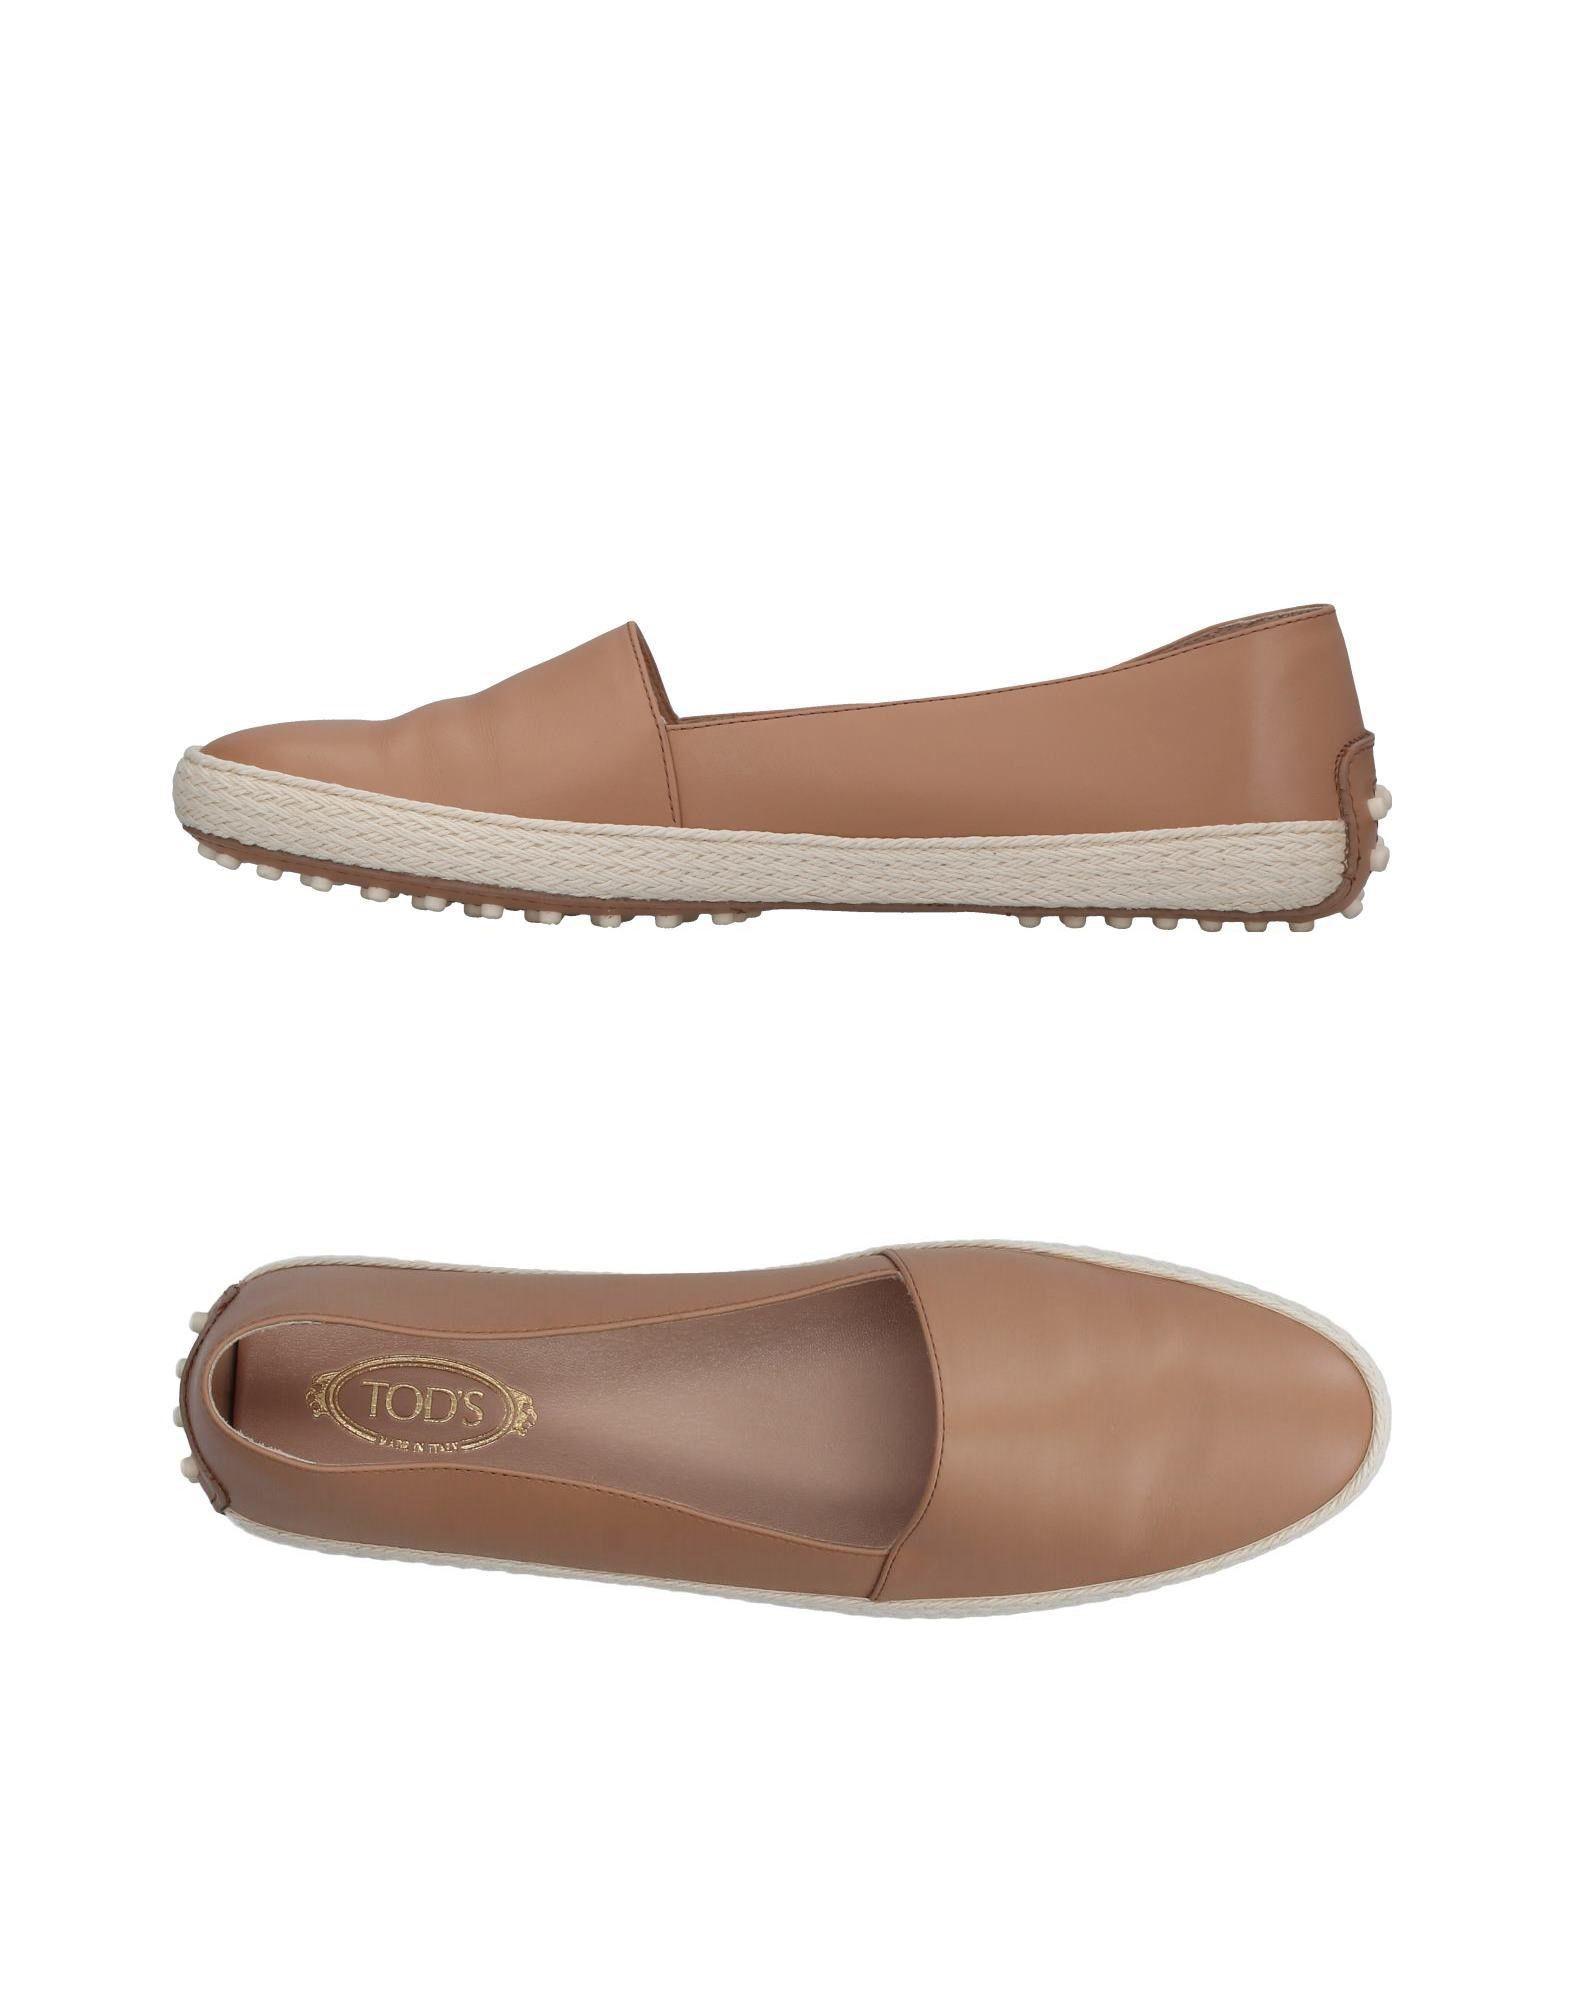 Haltbare Mode billige Schuhe Tod's Mokassins Damen  11308067KP Heiße Schuhe